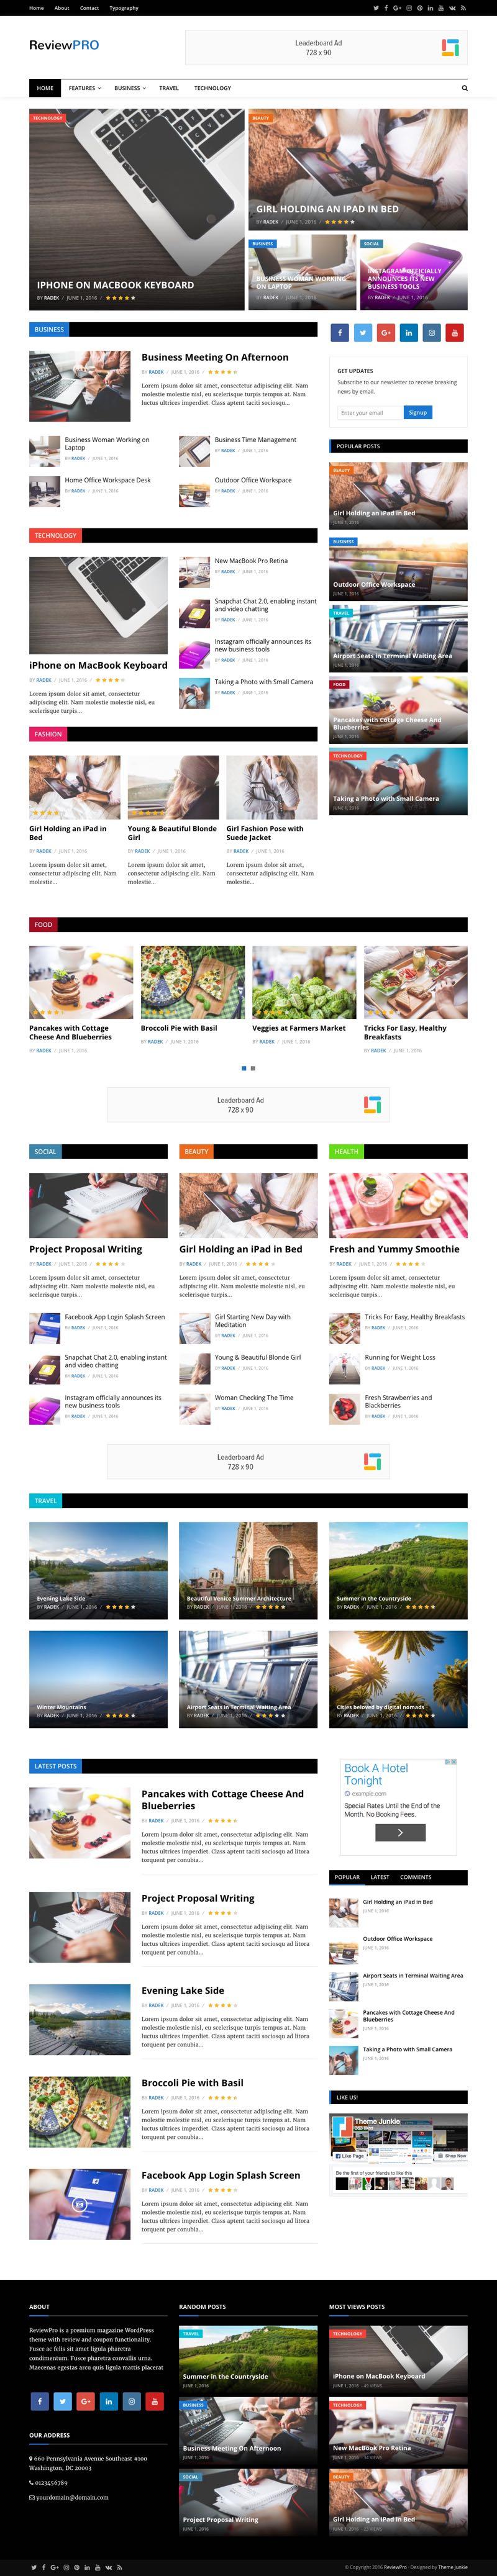 ReviewPro WordPress Deals & Coupon Reviews Theme